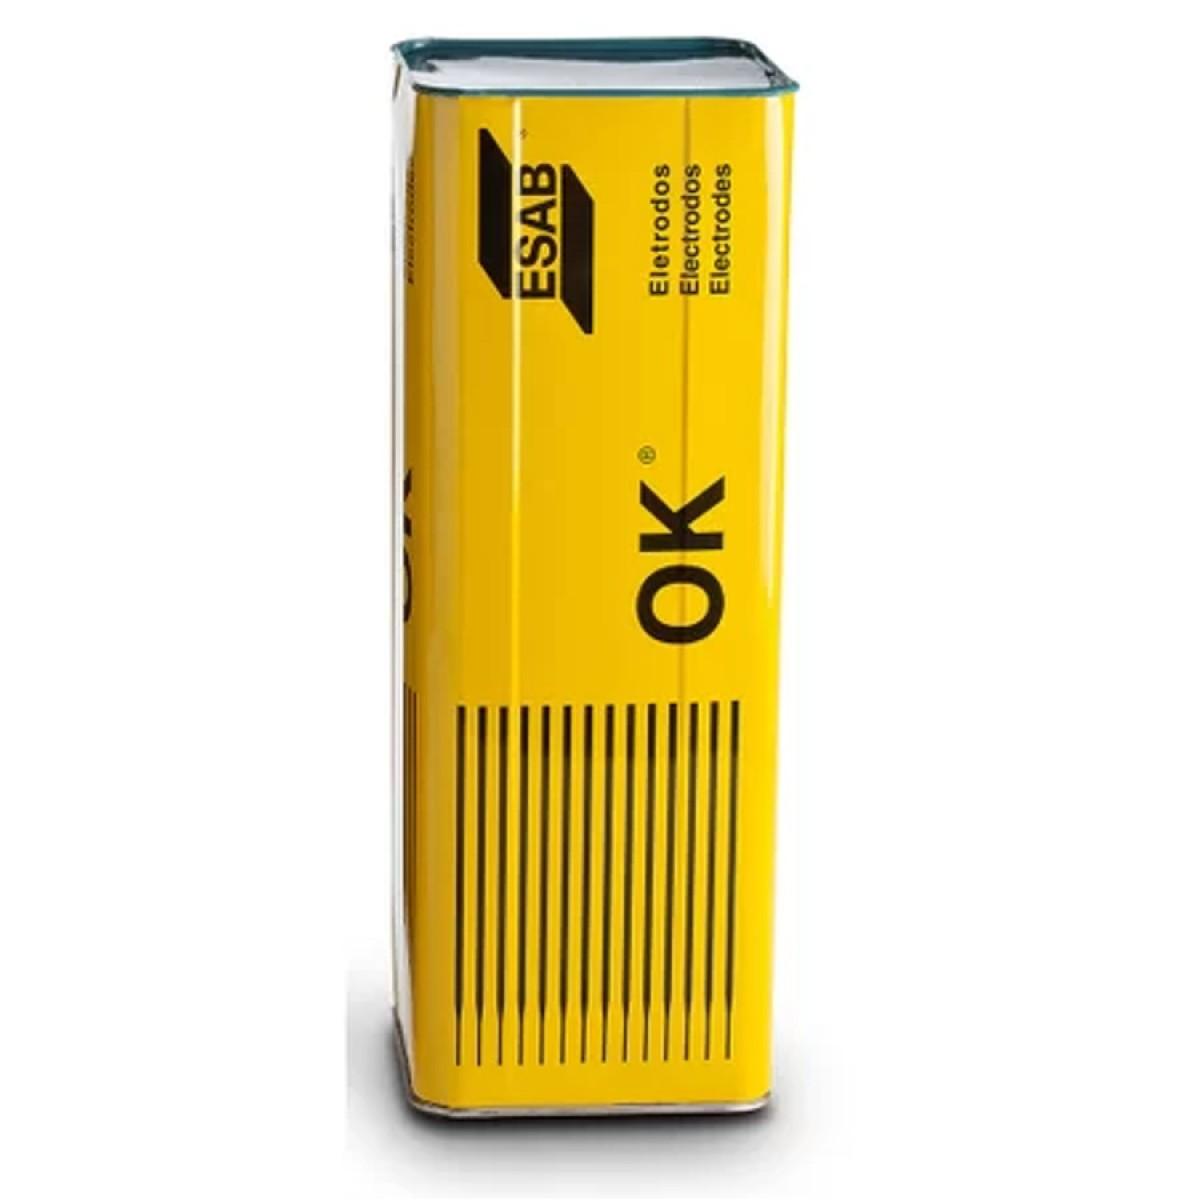 Eletrodo OK 48.04 2,50x350mm Esab (1kg)